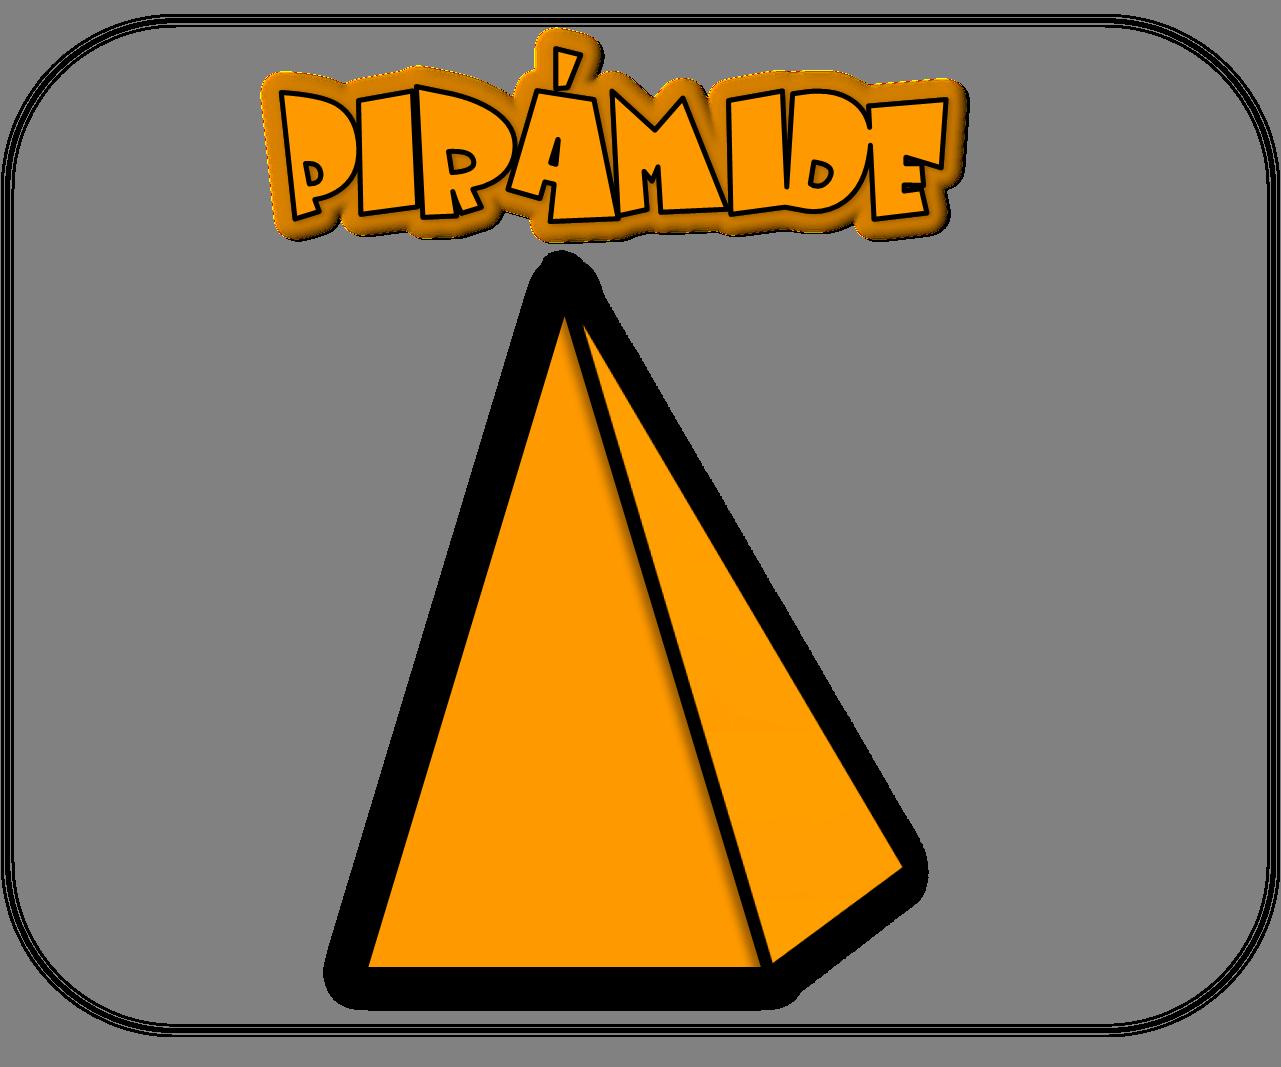 Carteles de las figuras geométricas pirámide